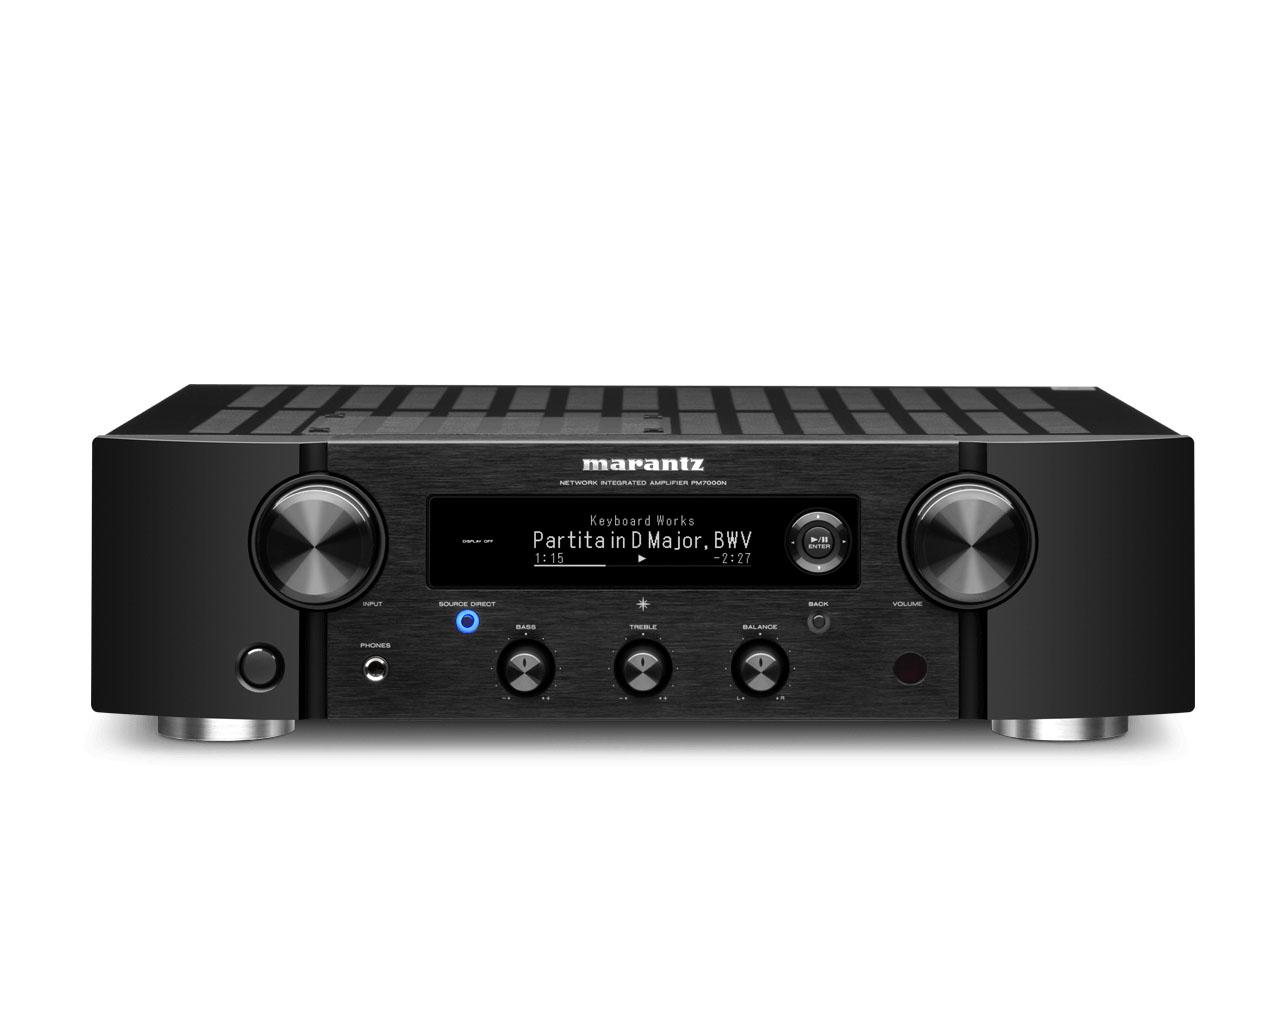 Marantz PM 7000 N Stereo-Vollverstärker mit HEOS Built-in